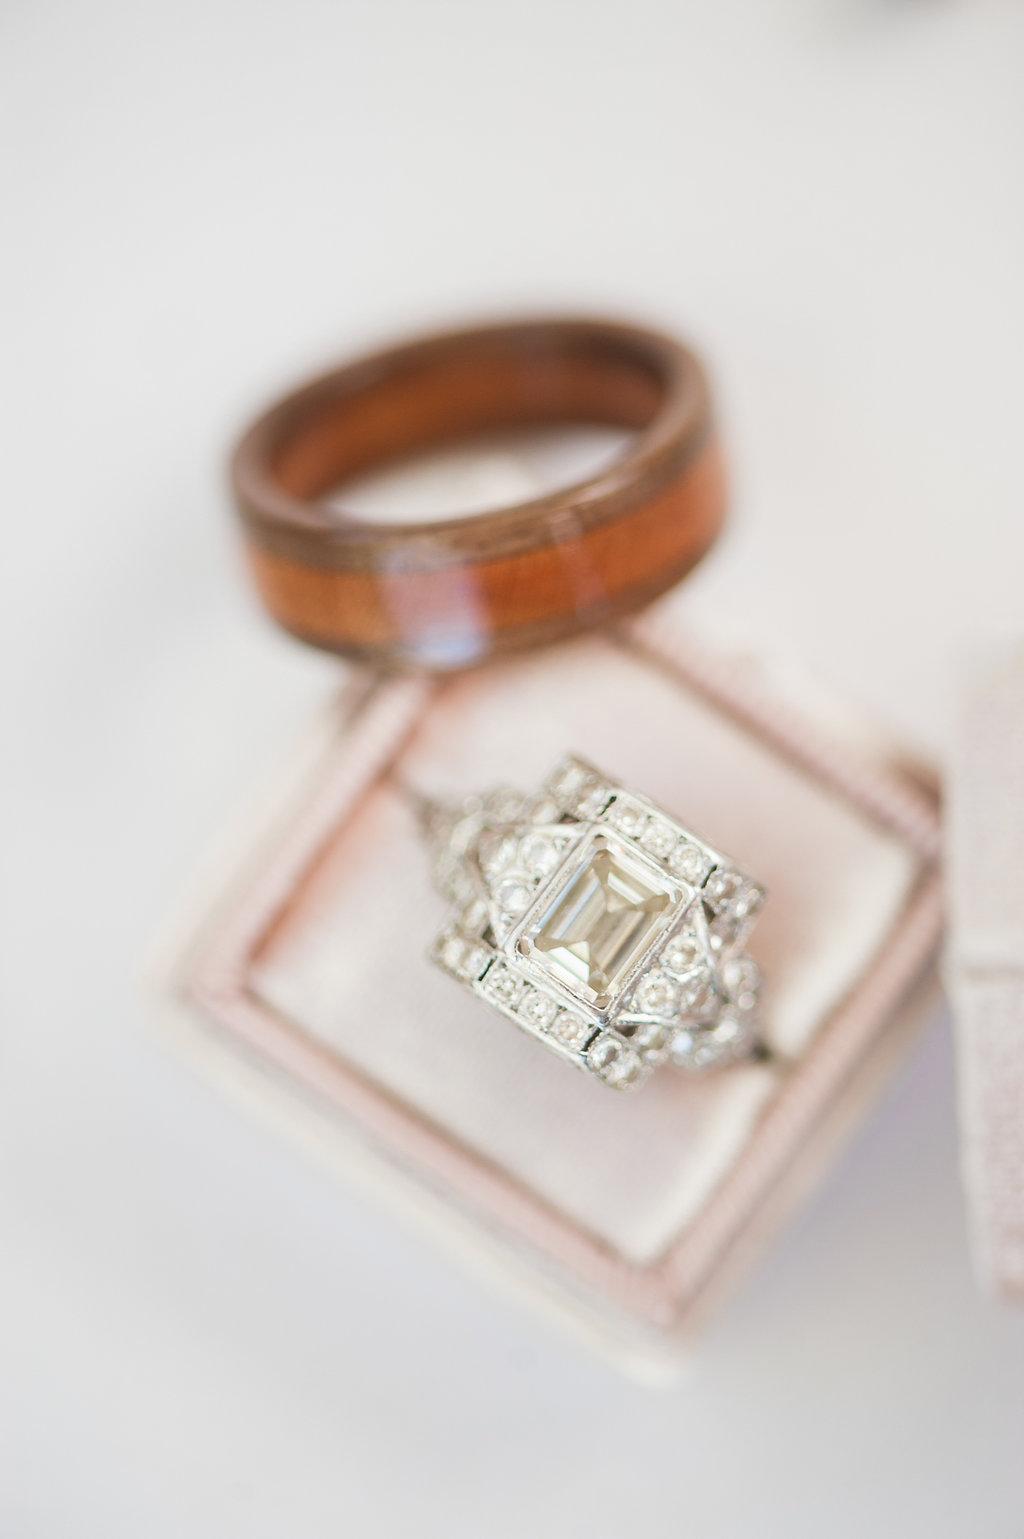 Unique Engagement Rings - Iowa Farm Wedding - Private Estate Weddings